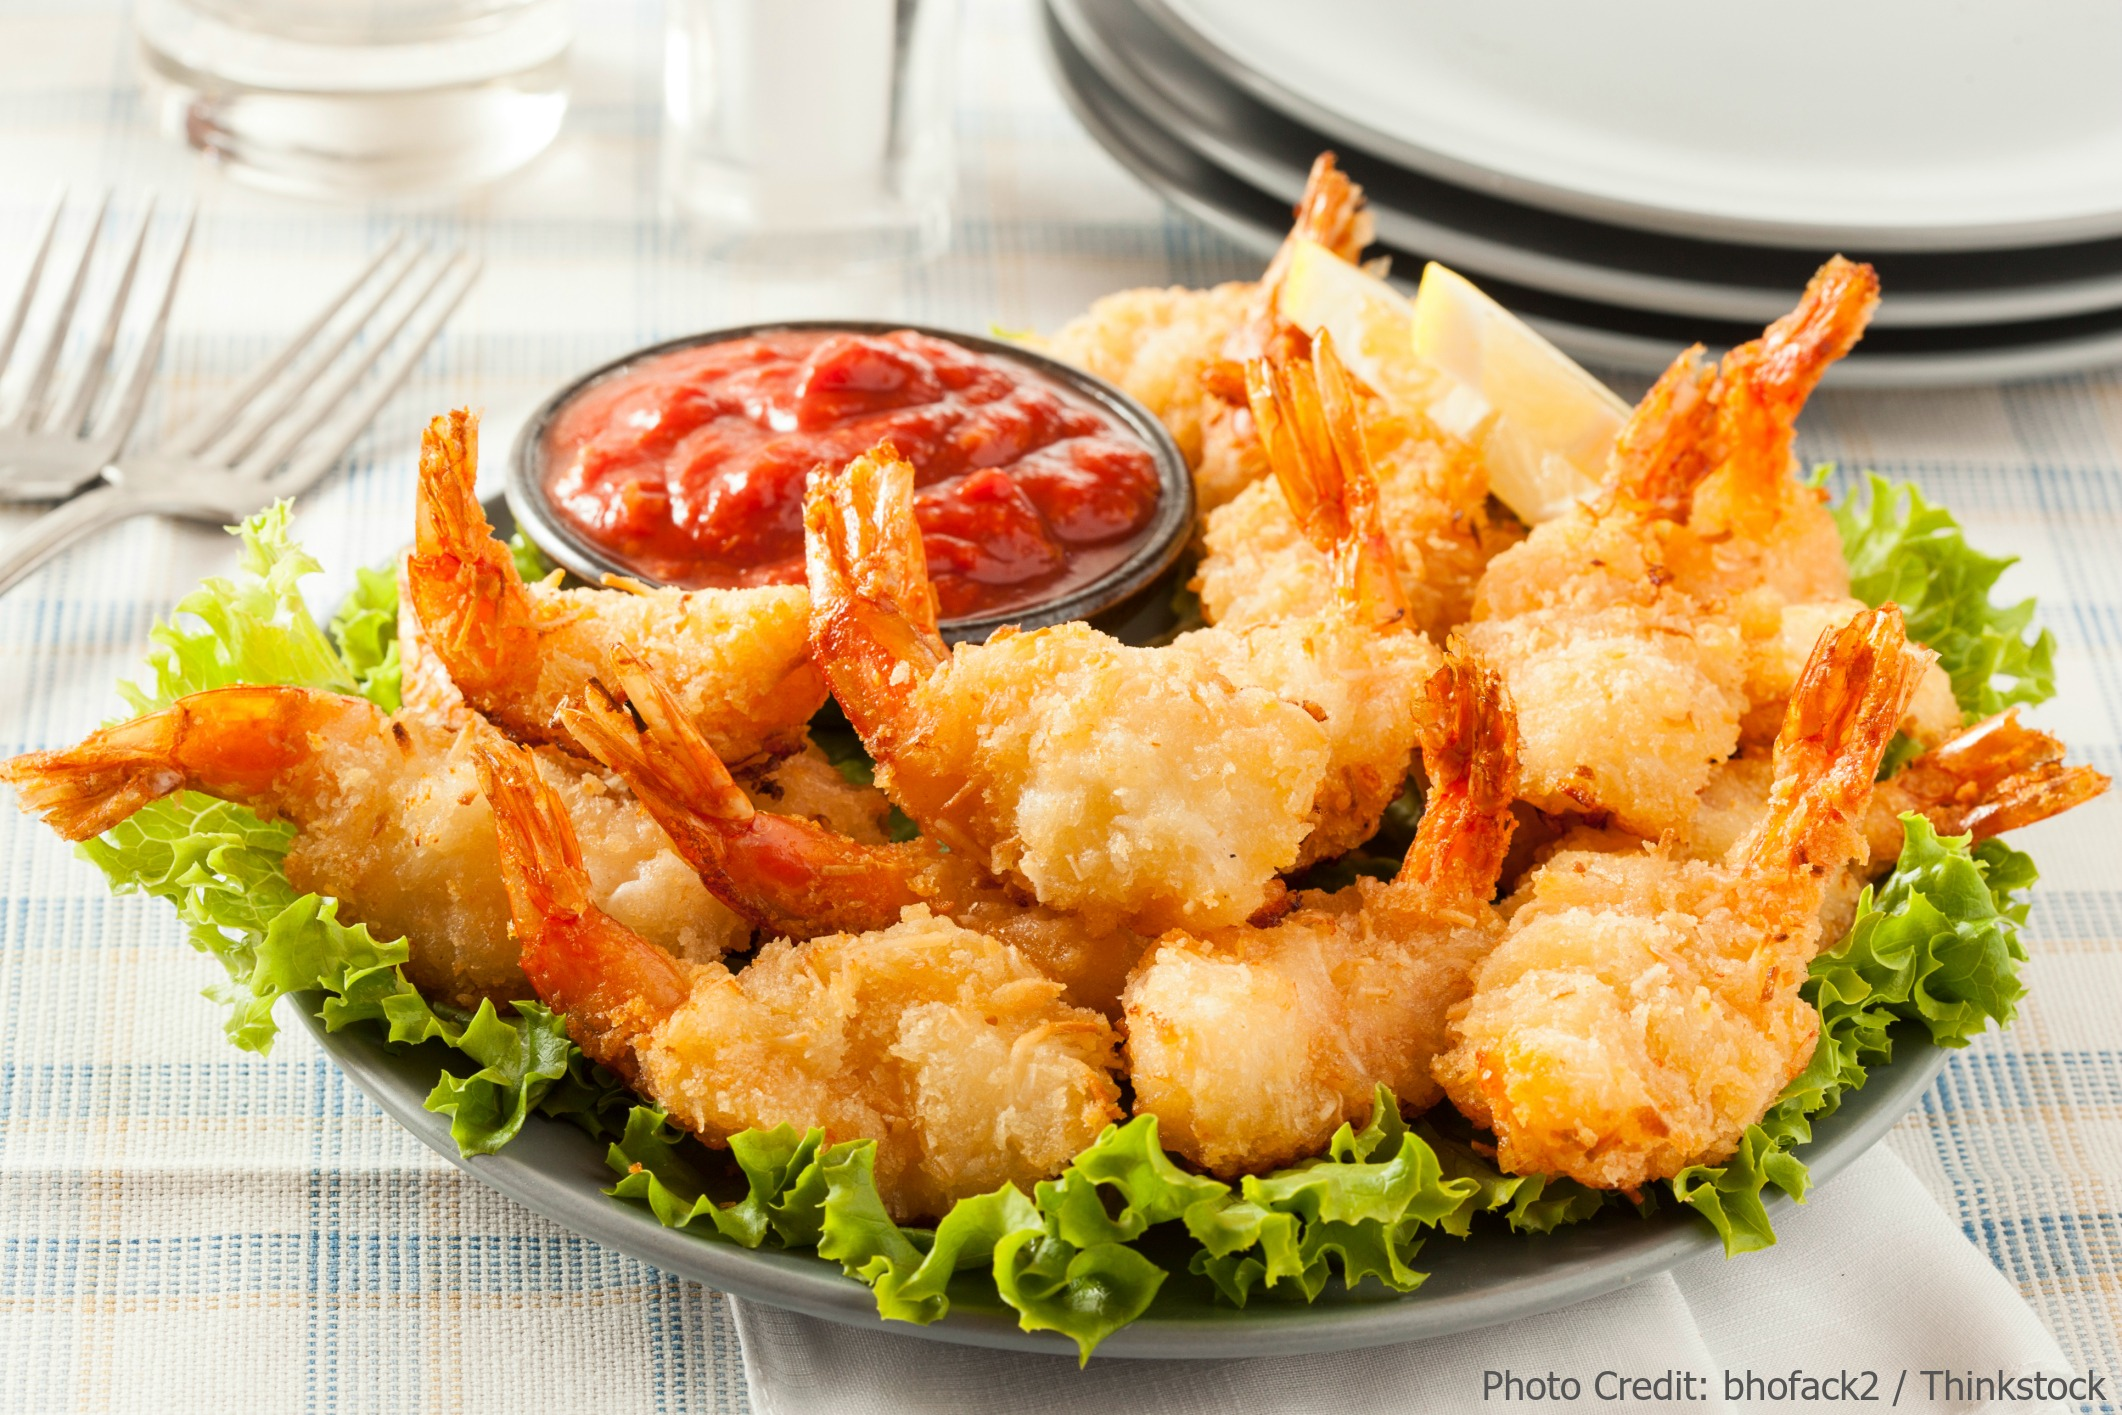 6 Of The Best Restaurants In Hilton Head